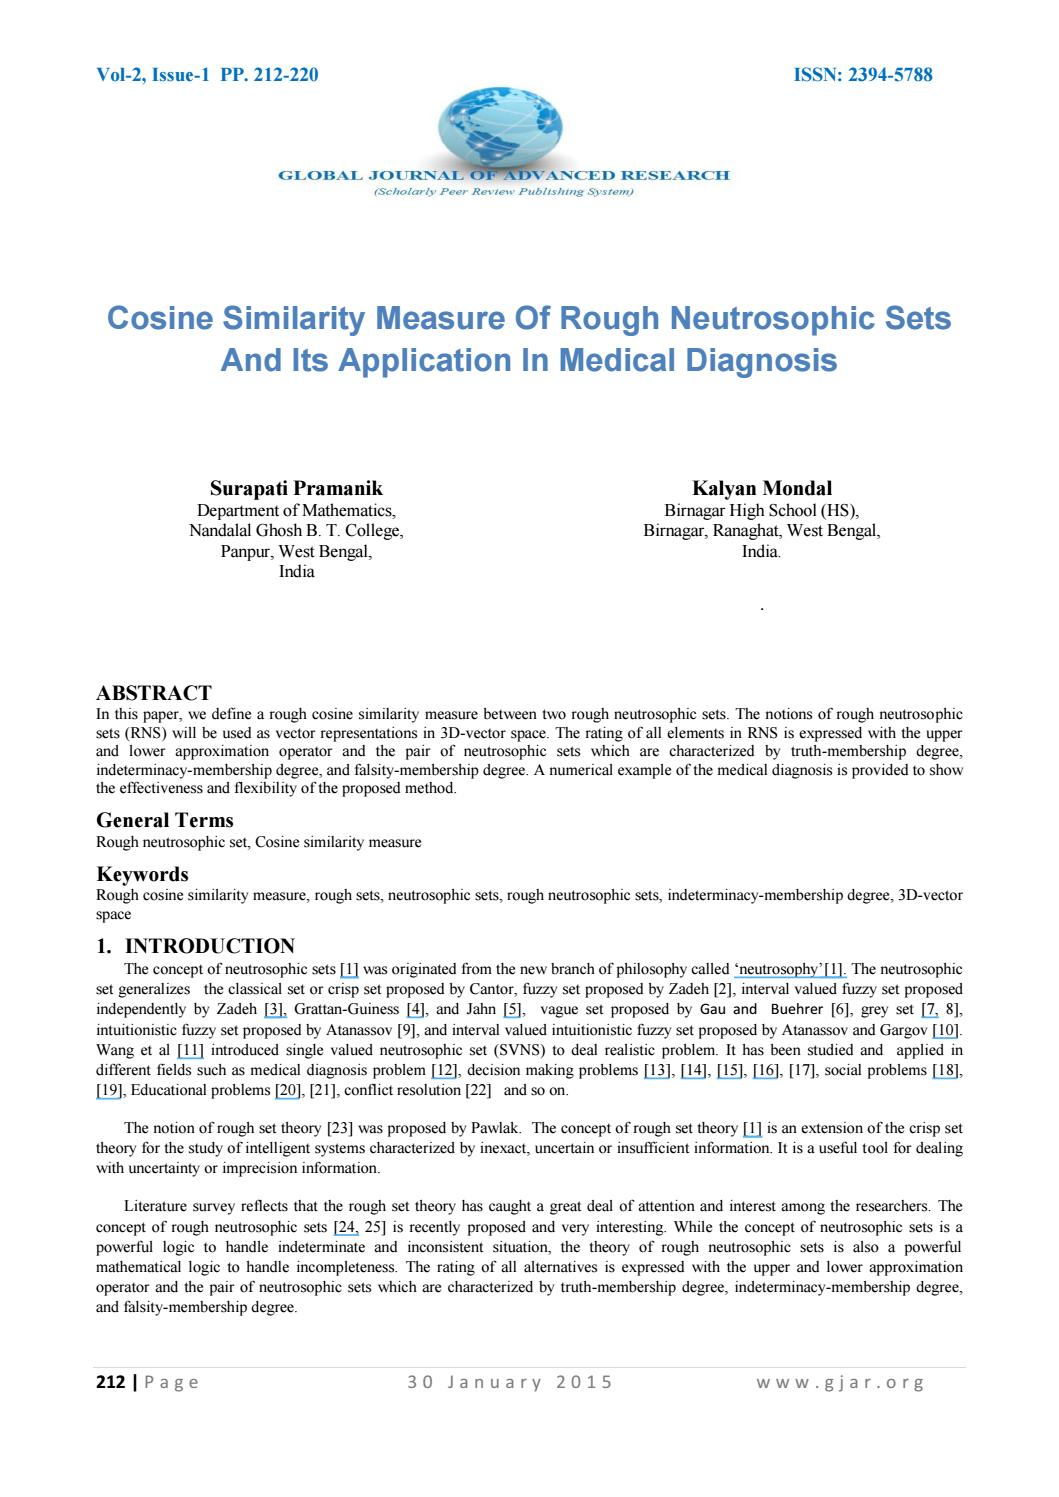 Cosine Similarity Measure Of Rough Neutrosophic Sets And Its